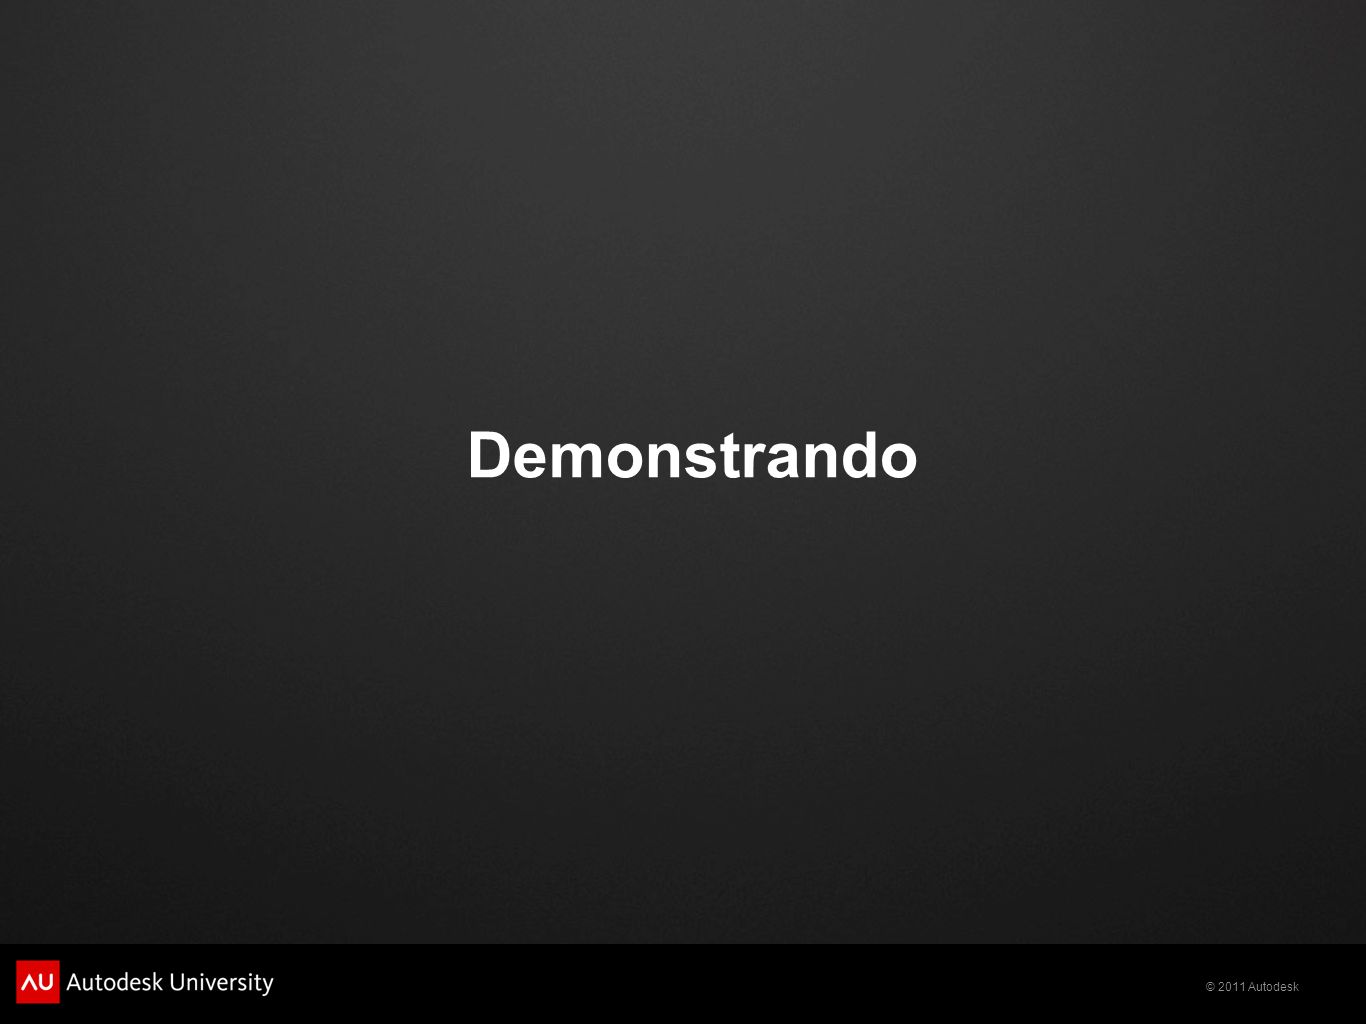 Demonstrando